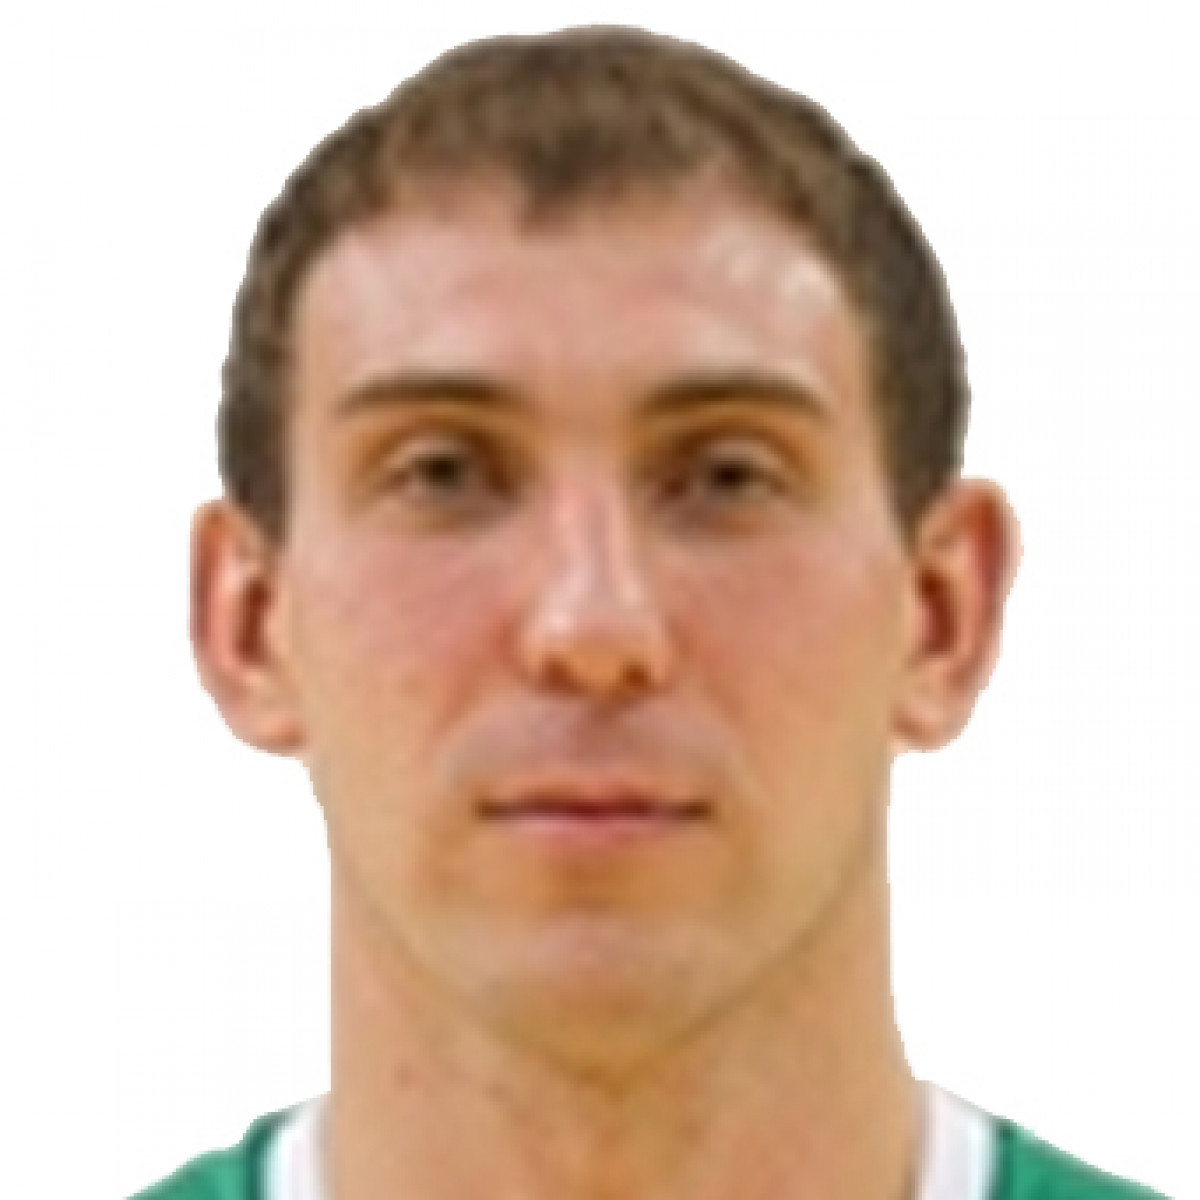 Aleksandr Riabchuk